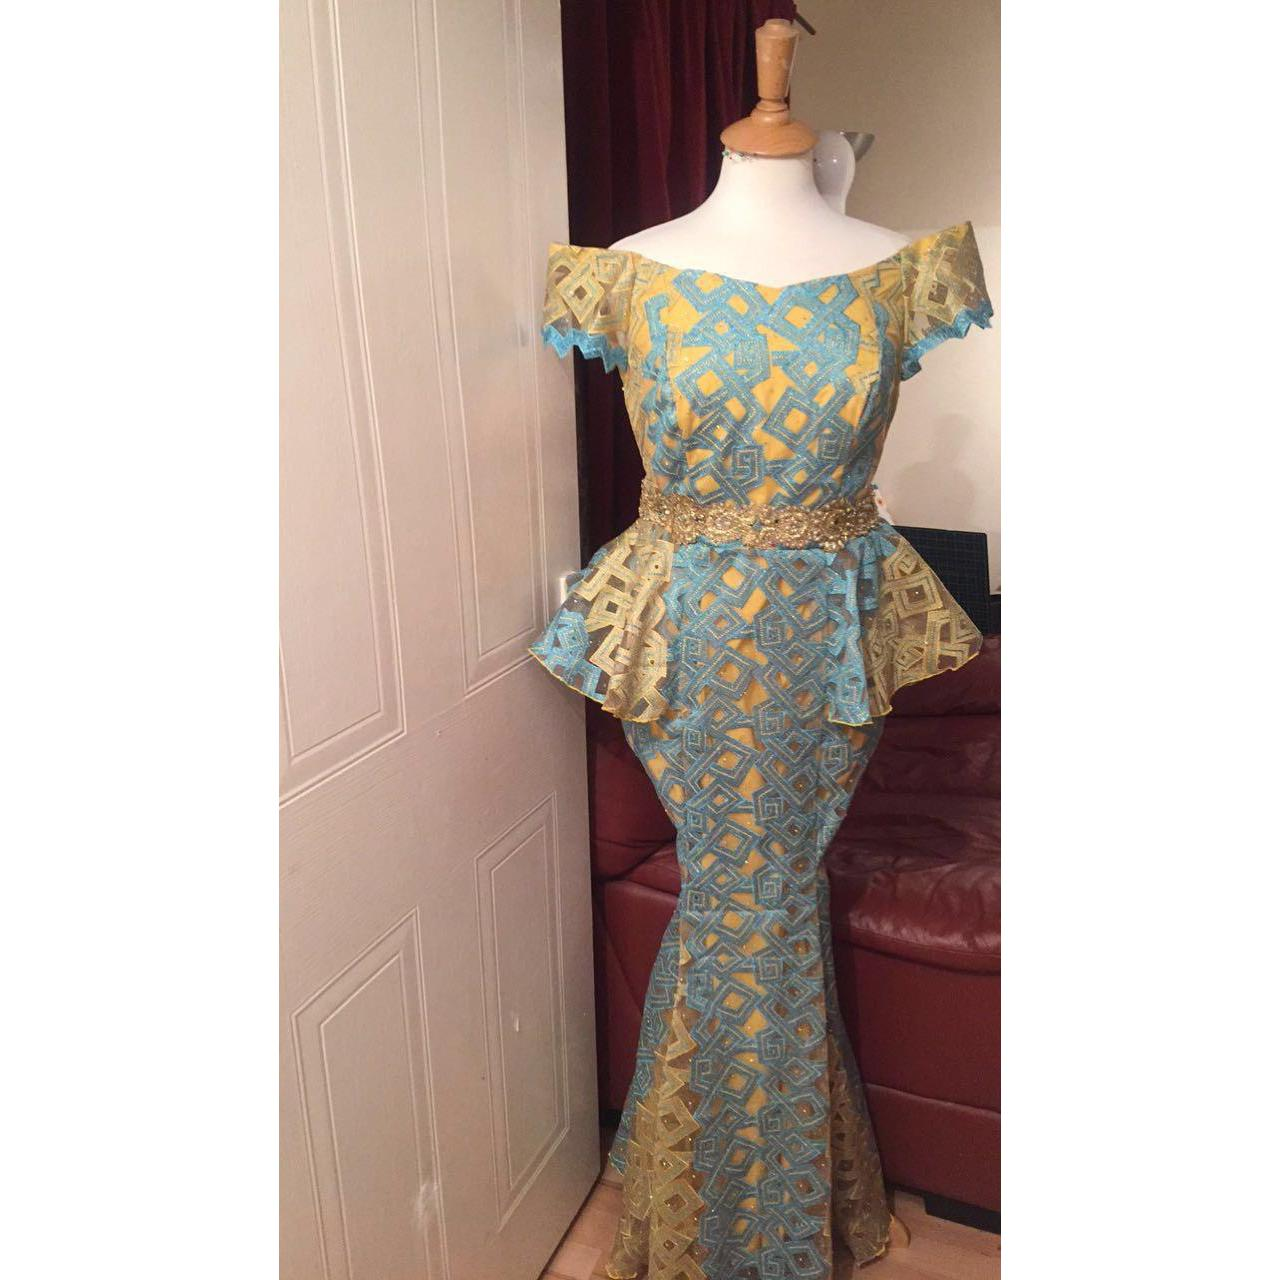 Alice Fabrics Store & Fashion Design - Bolton, Lancashire  - 07711 238653 | ShowMeLocal.com